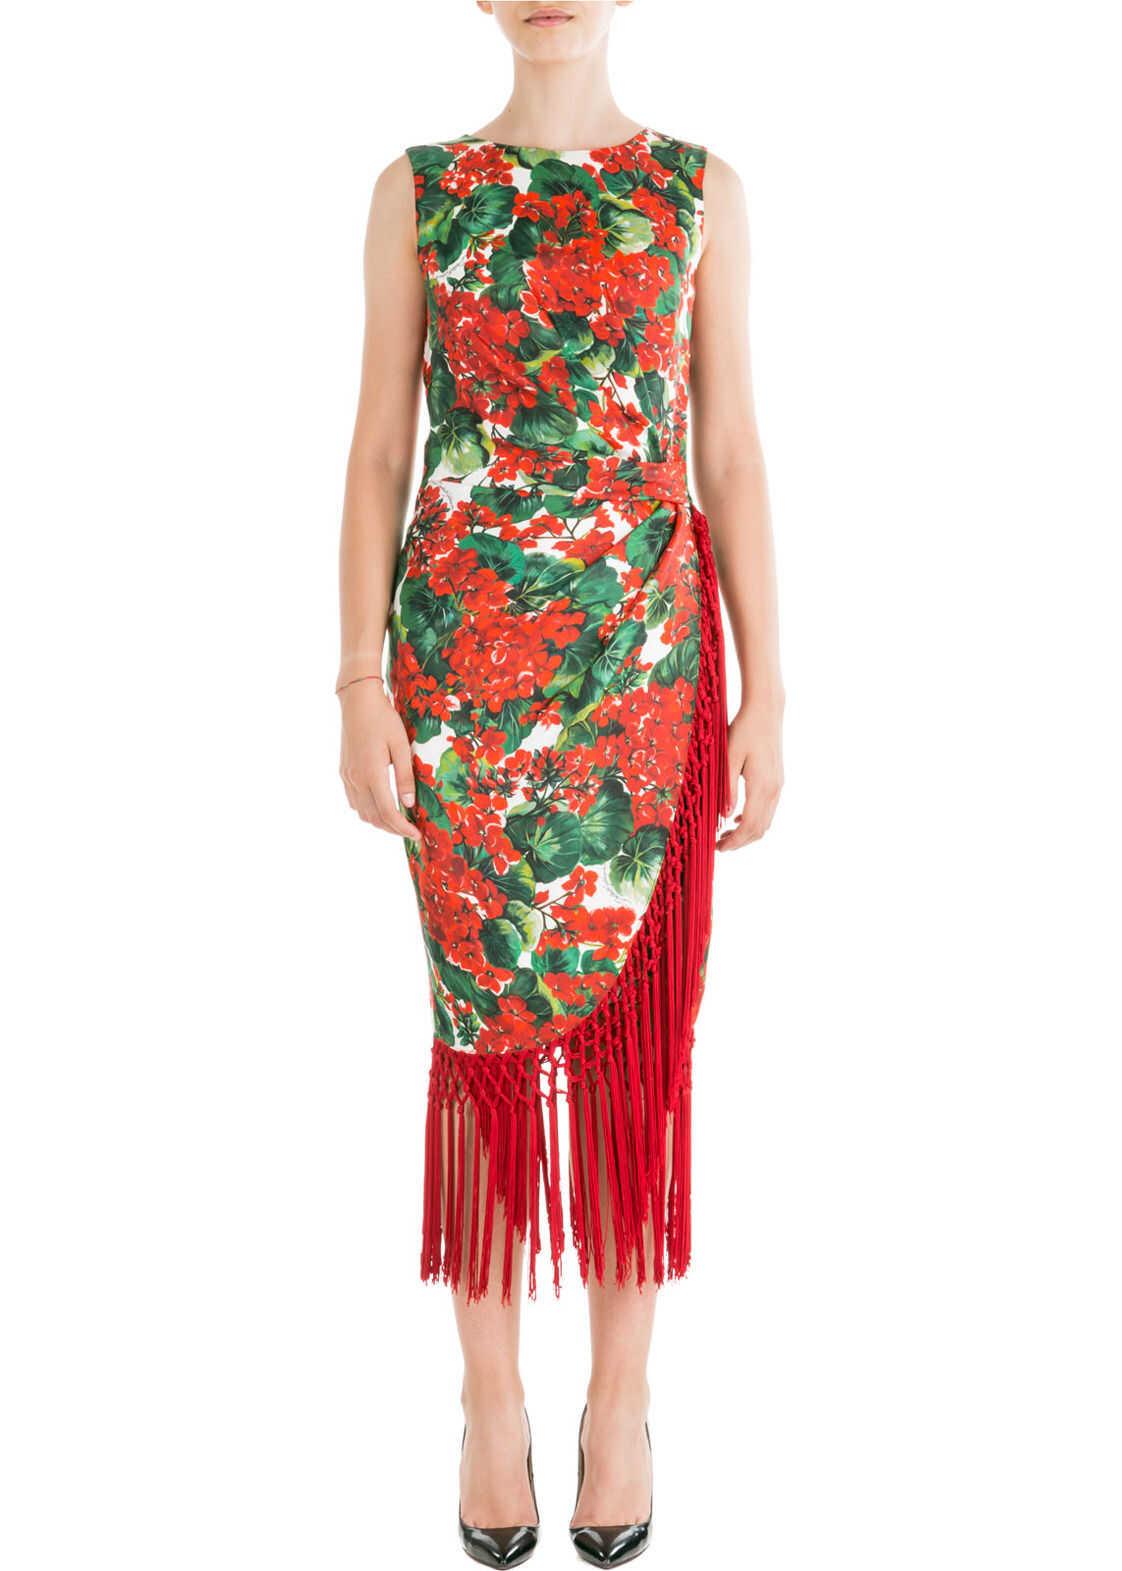 Dolce & Gabbana Dress Sleeveless Red